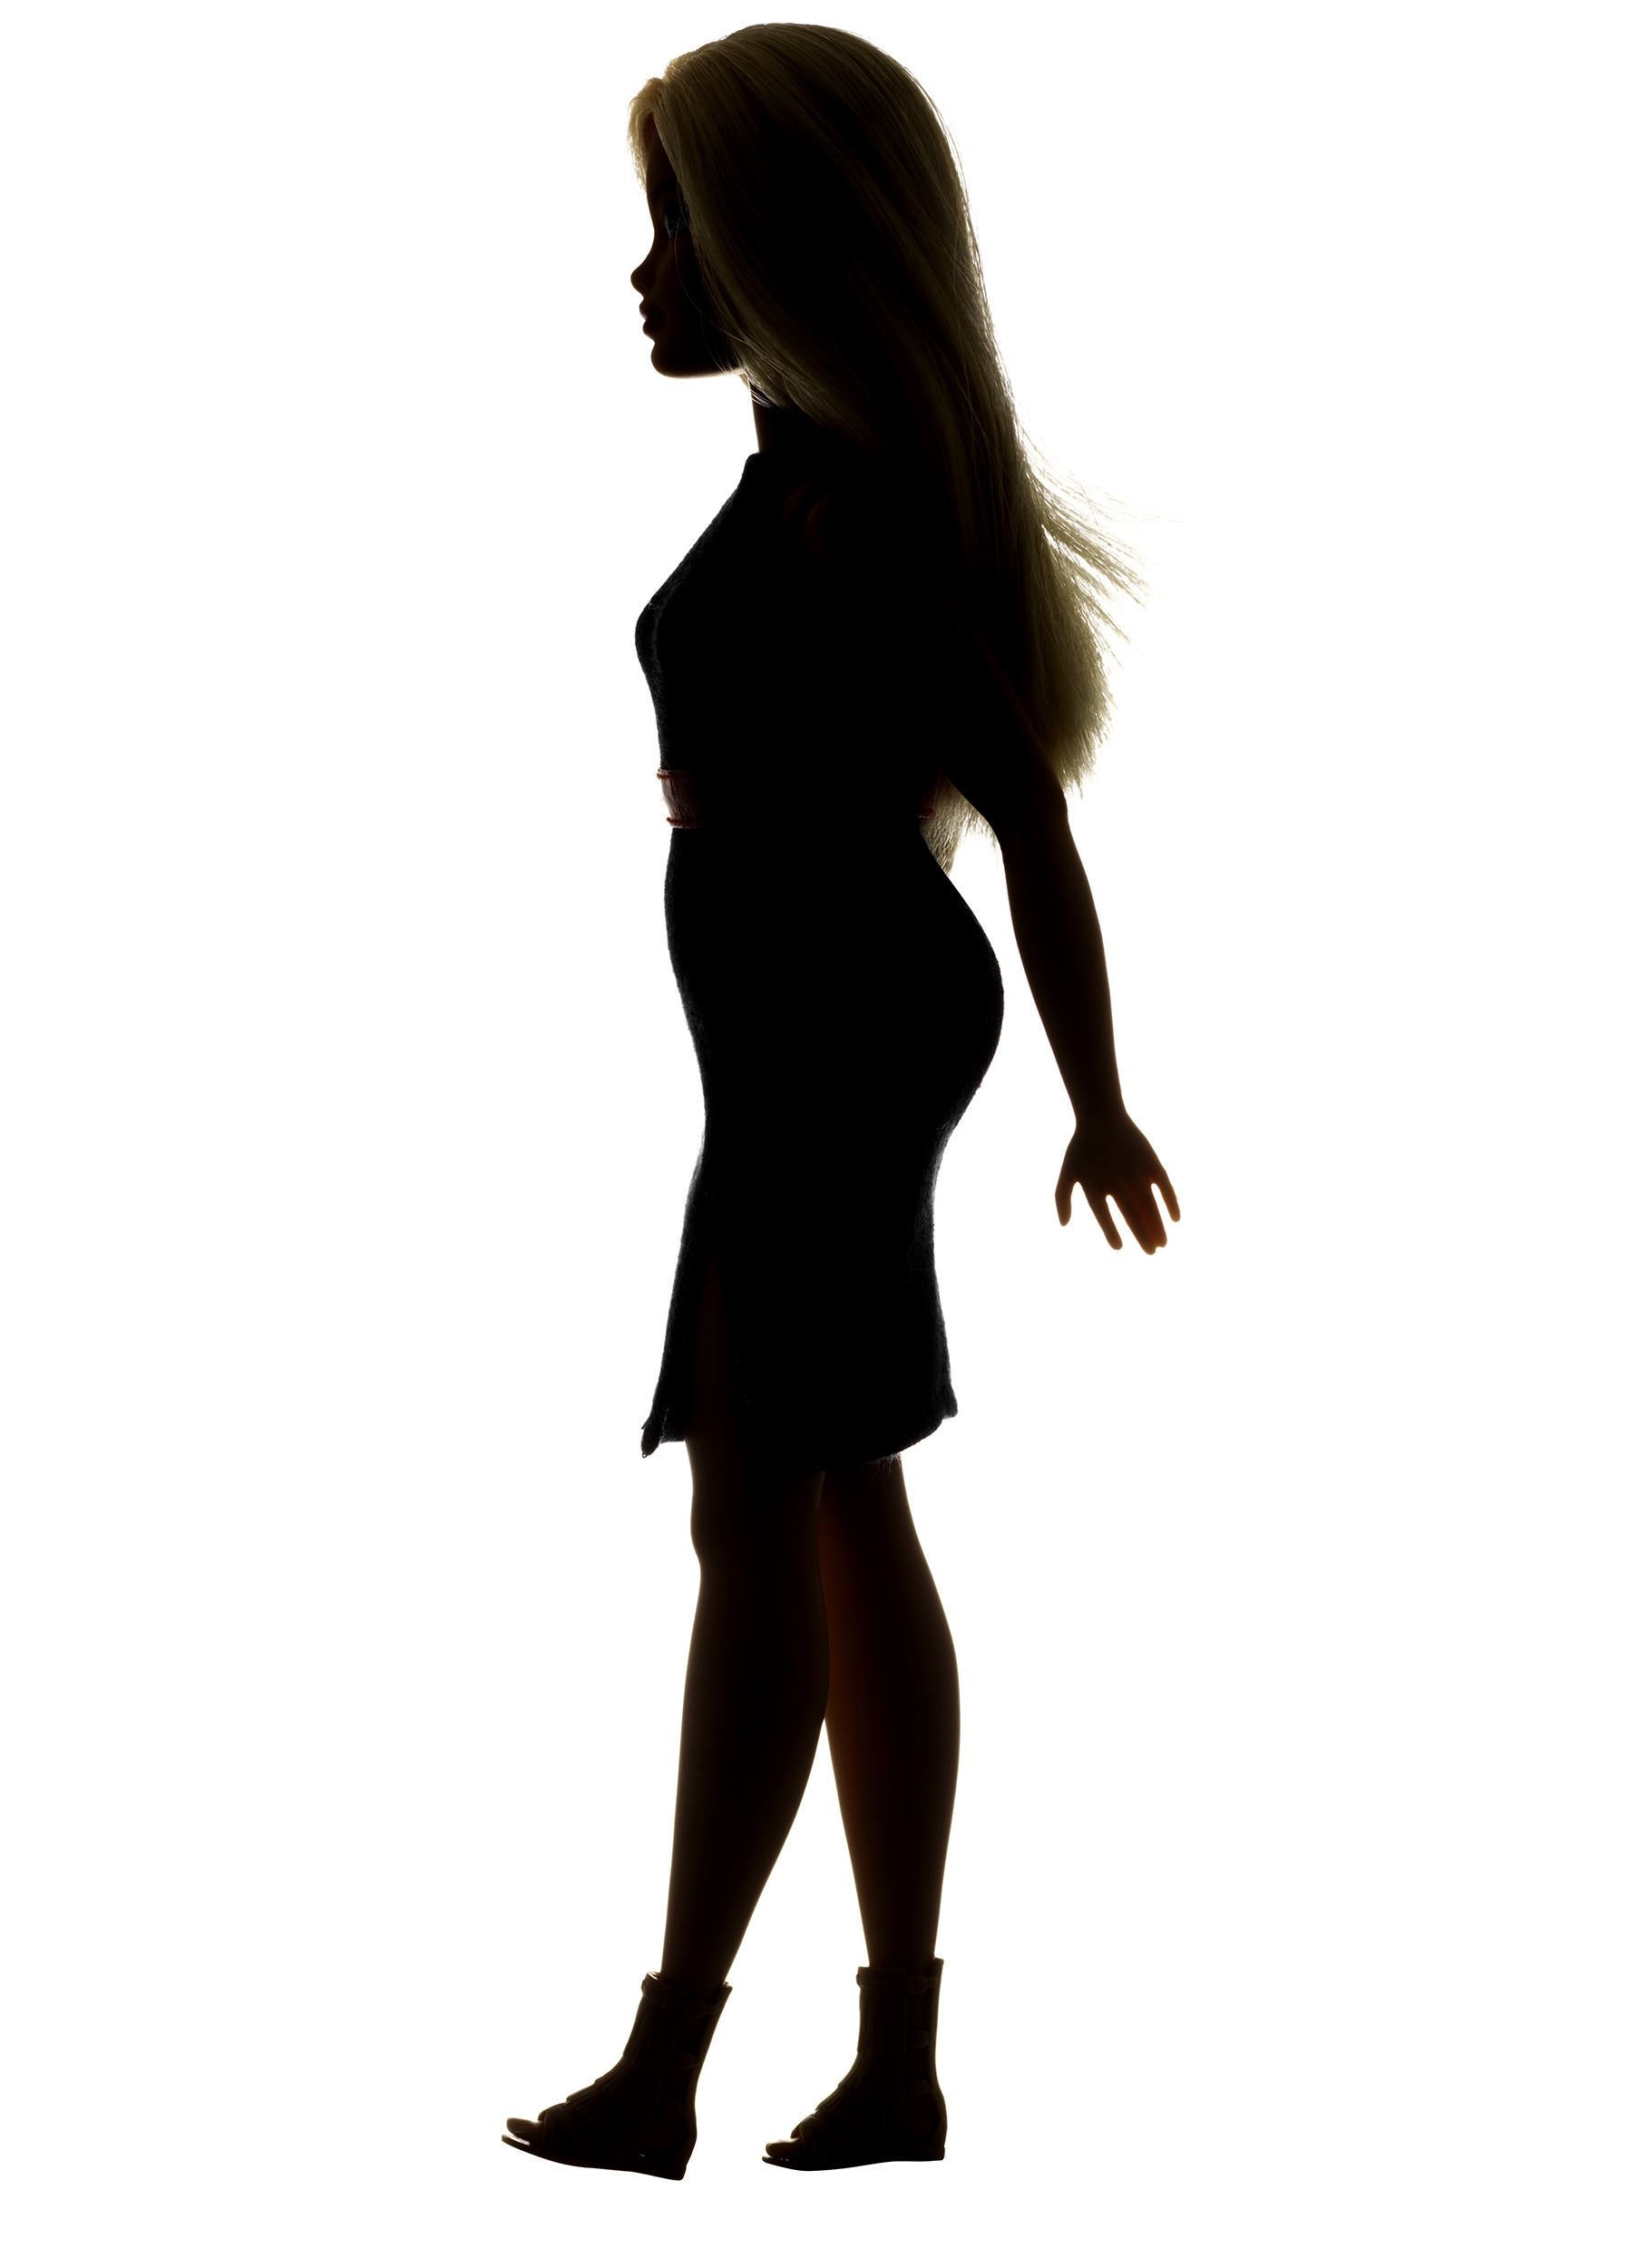 A silhouette of Mattel's new Curvy Barbie